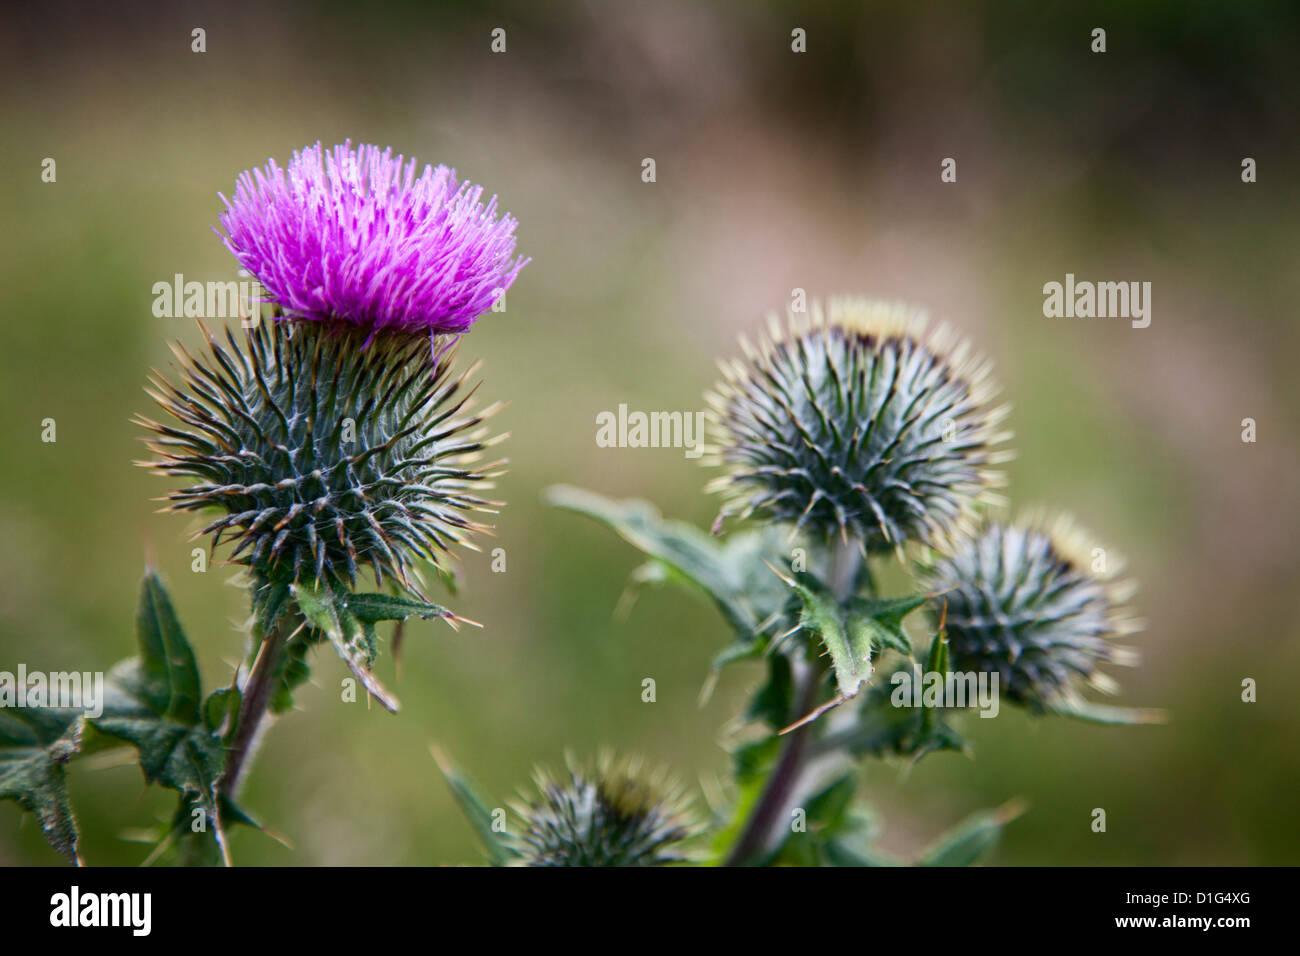 Scottish thistle near Dunnottar Castle, Stonehaven, Aberdeenshire, Scotland, United Kingdom, Europe - Stock Image